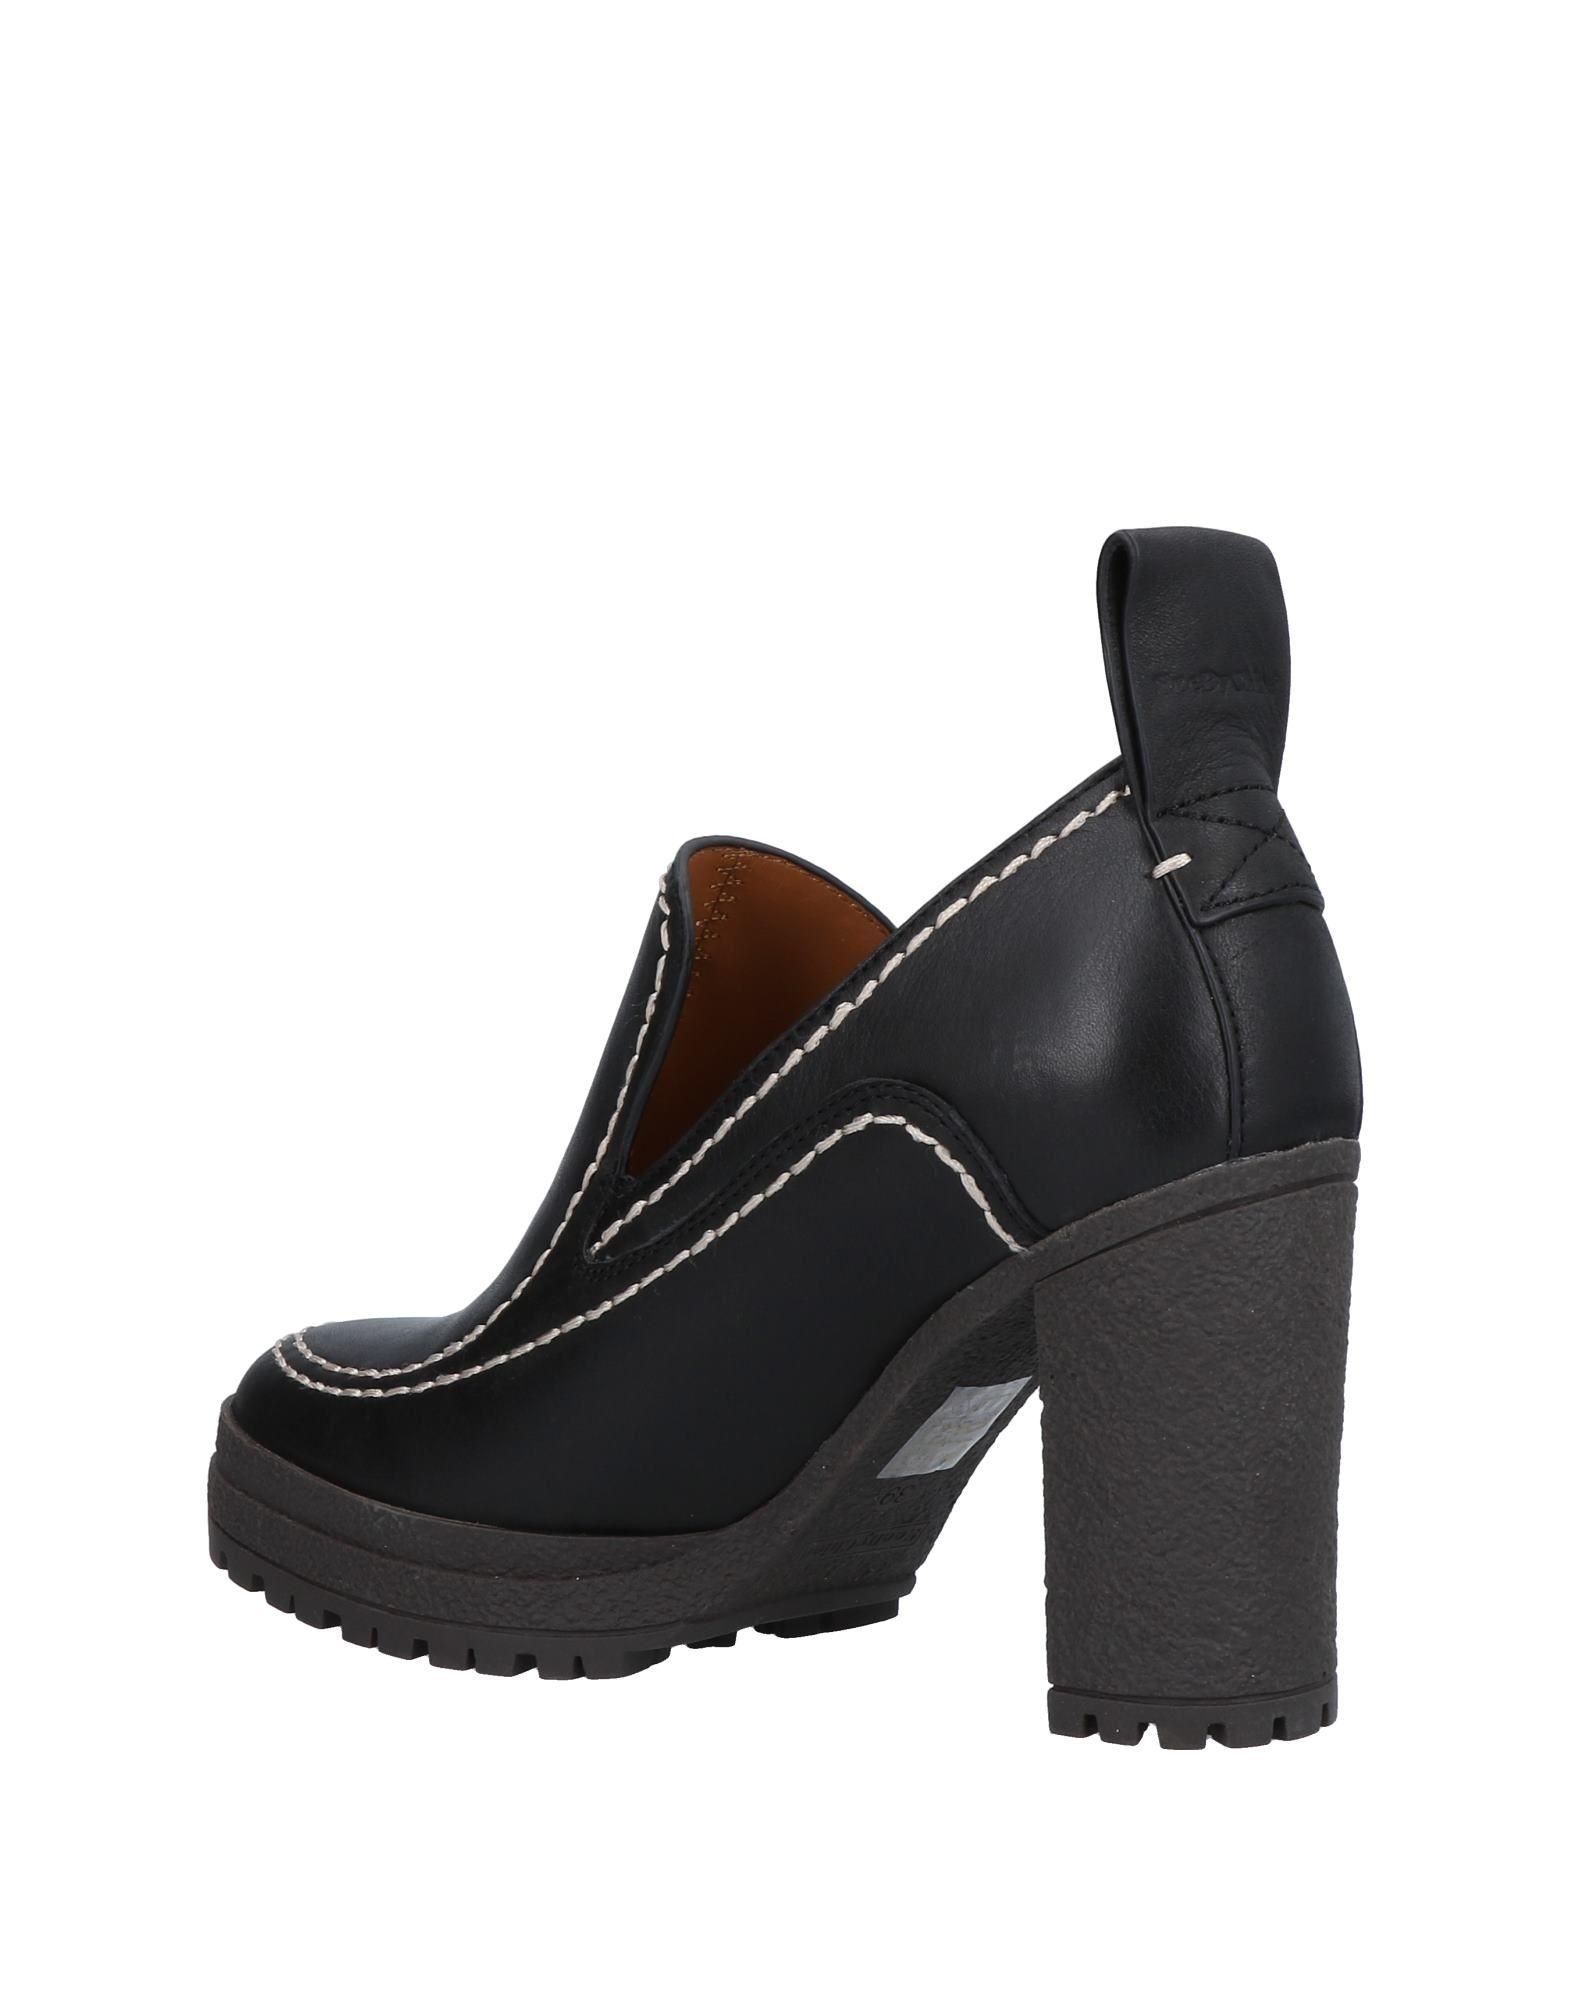 See Damen By Chloé Mokassins Damen See  11463126VS Neue Schuhe 2ad1c6